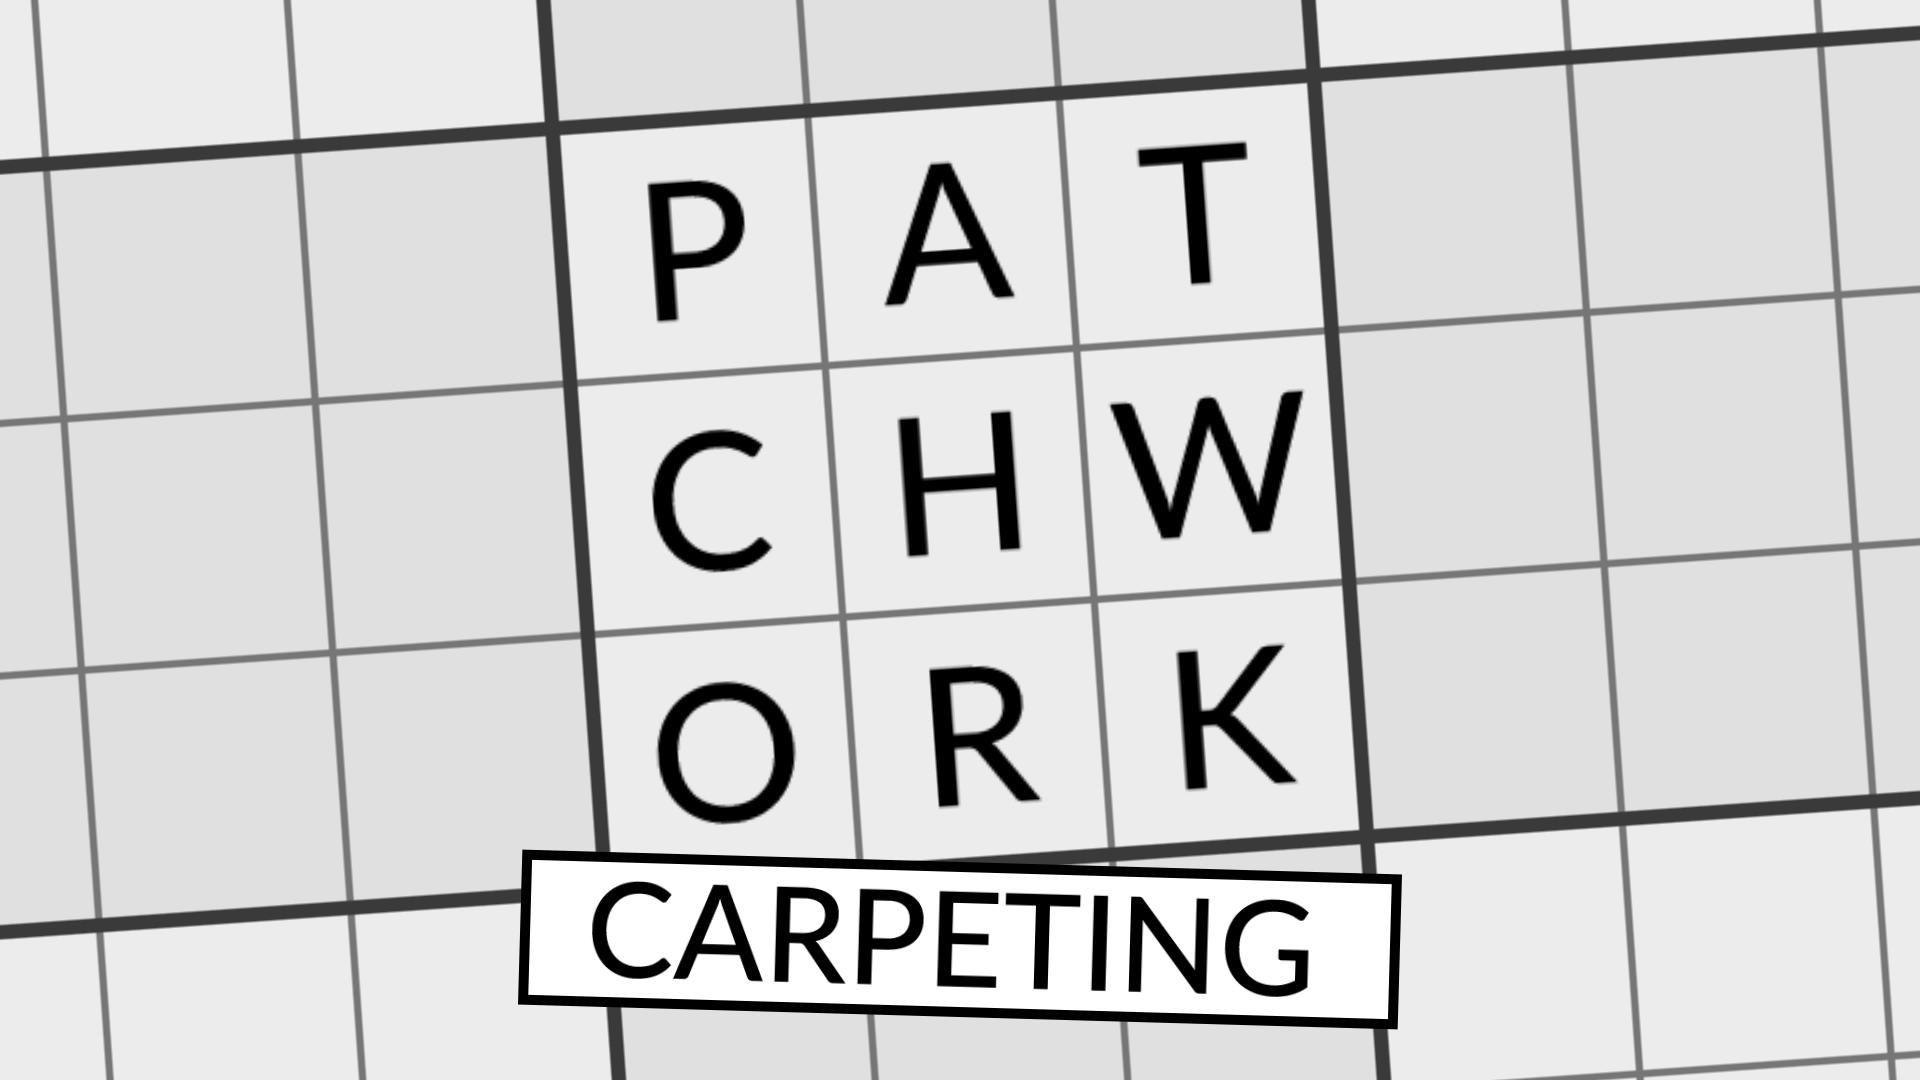 Patchwork Carpeting